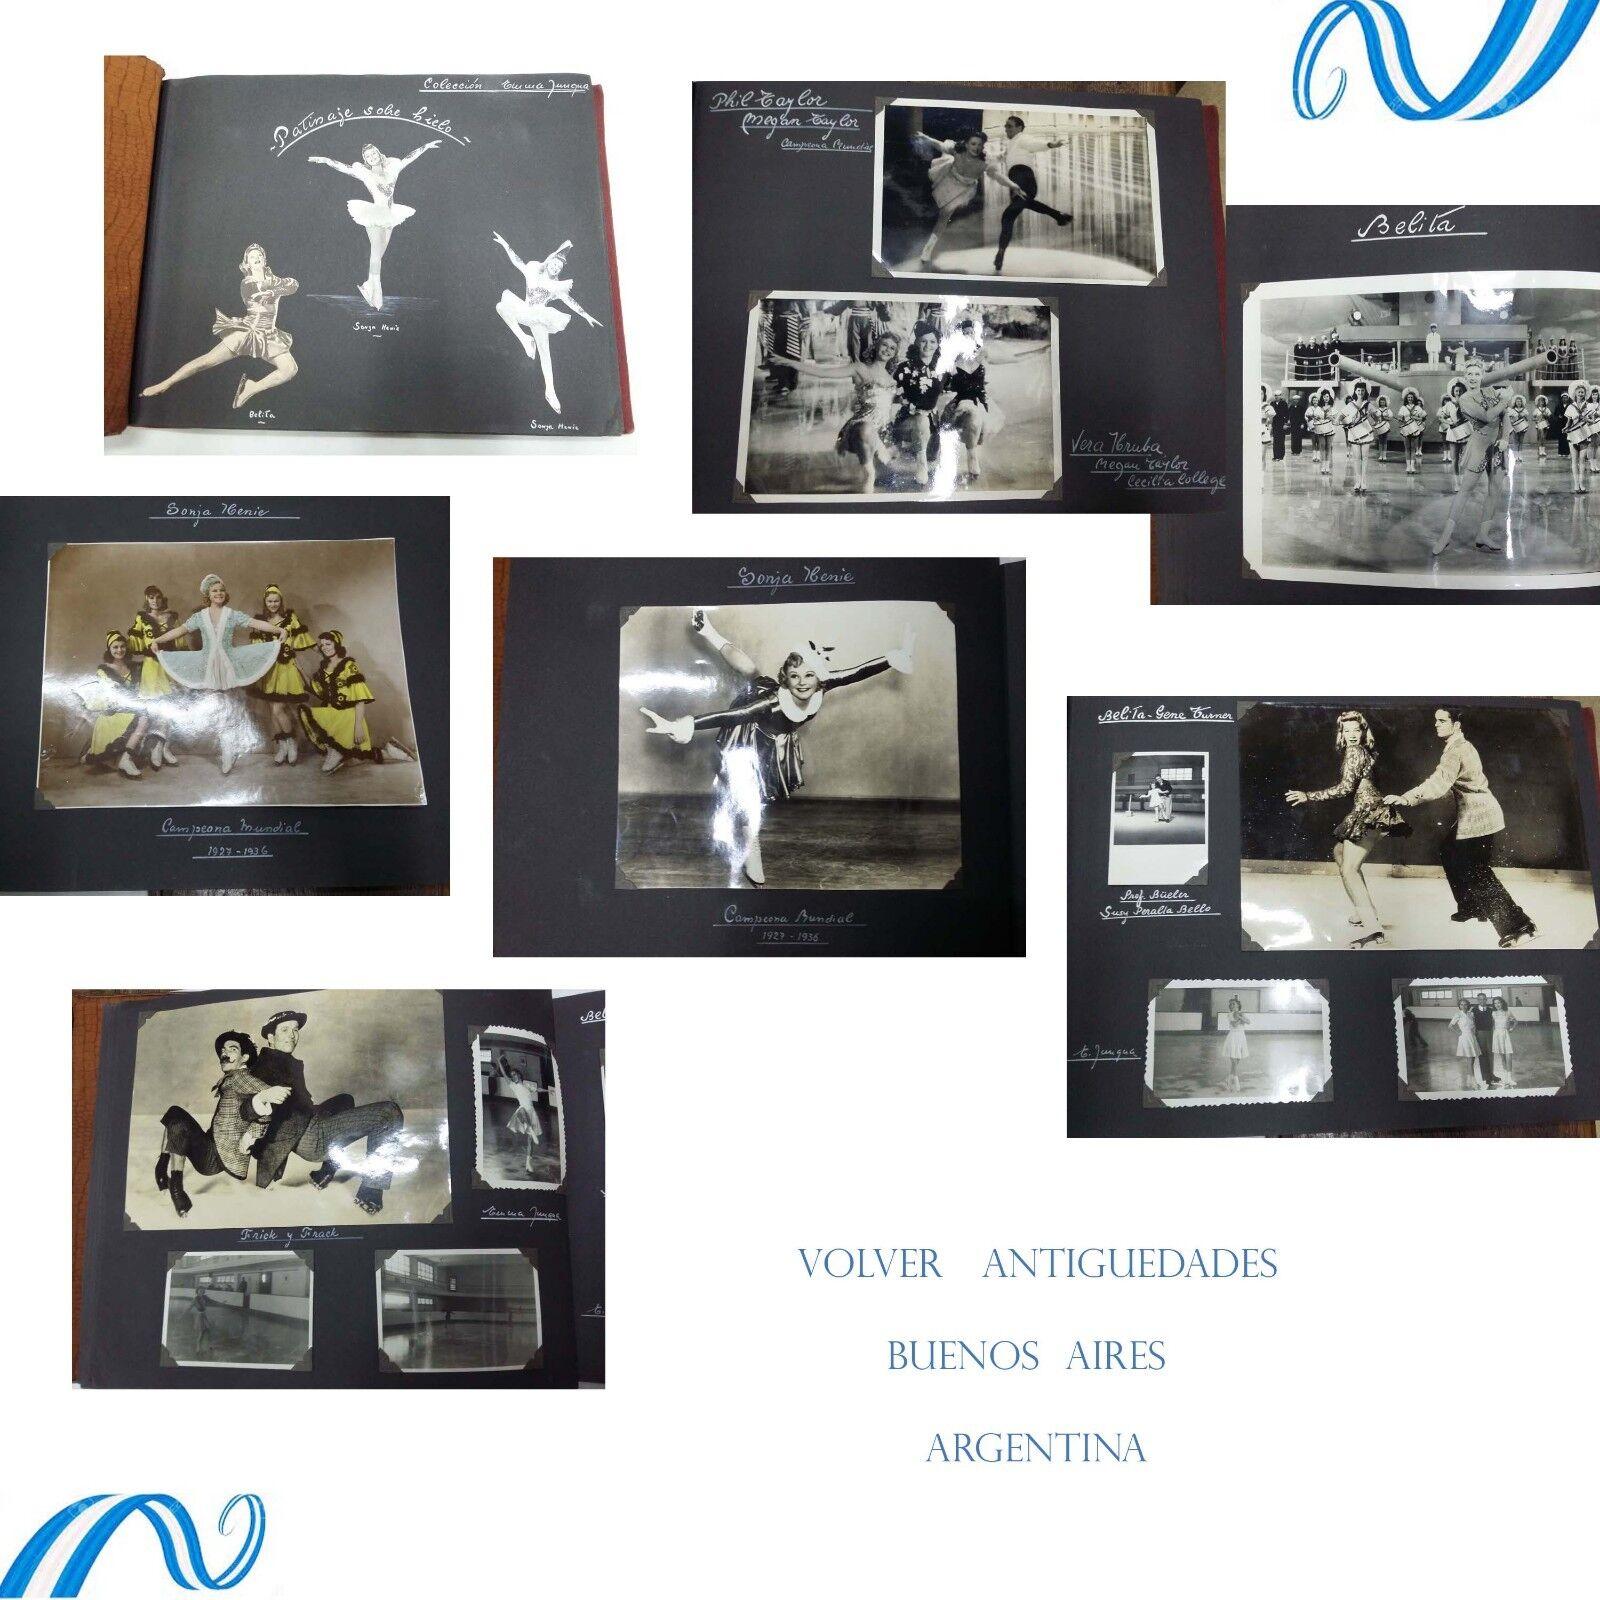 Historical Ice Skating photo album Henie Belita Hruba Ralston  Turner Dworshak  brand on sale clearance